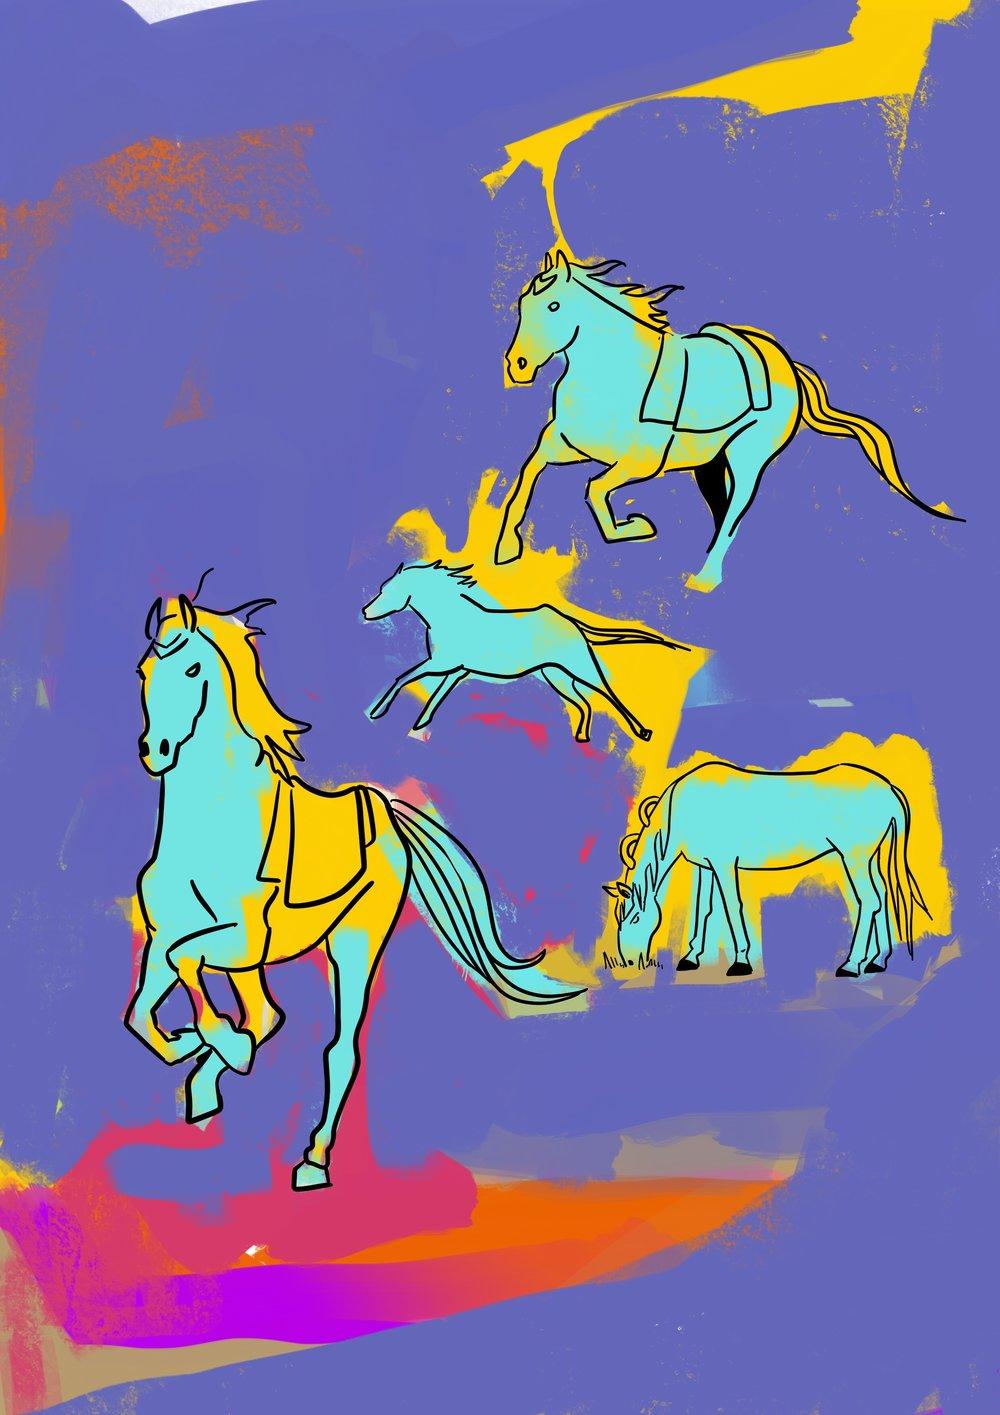 tilted_sun_horse-comic.jpg